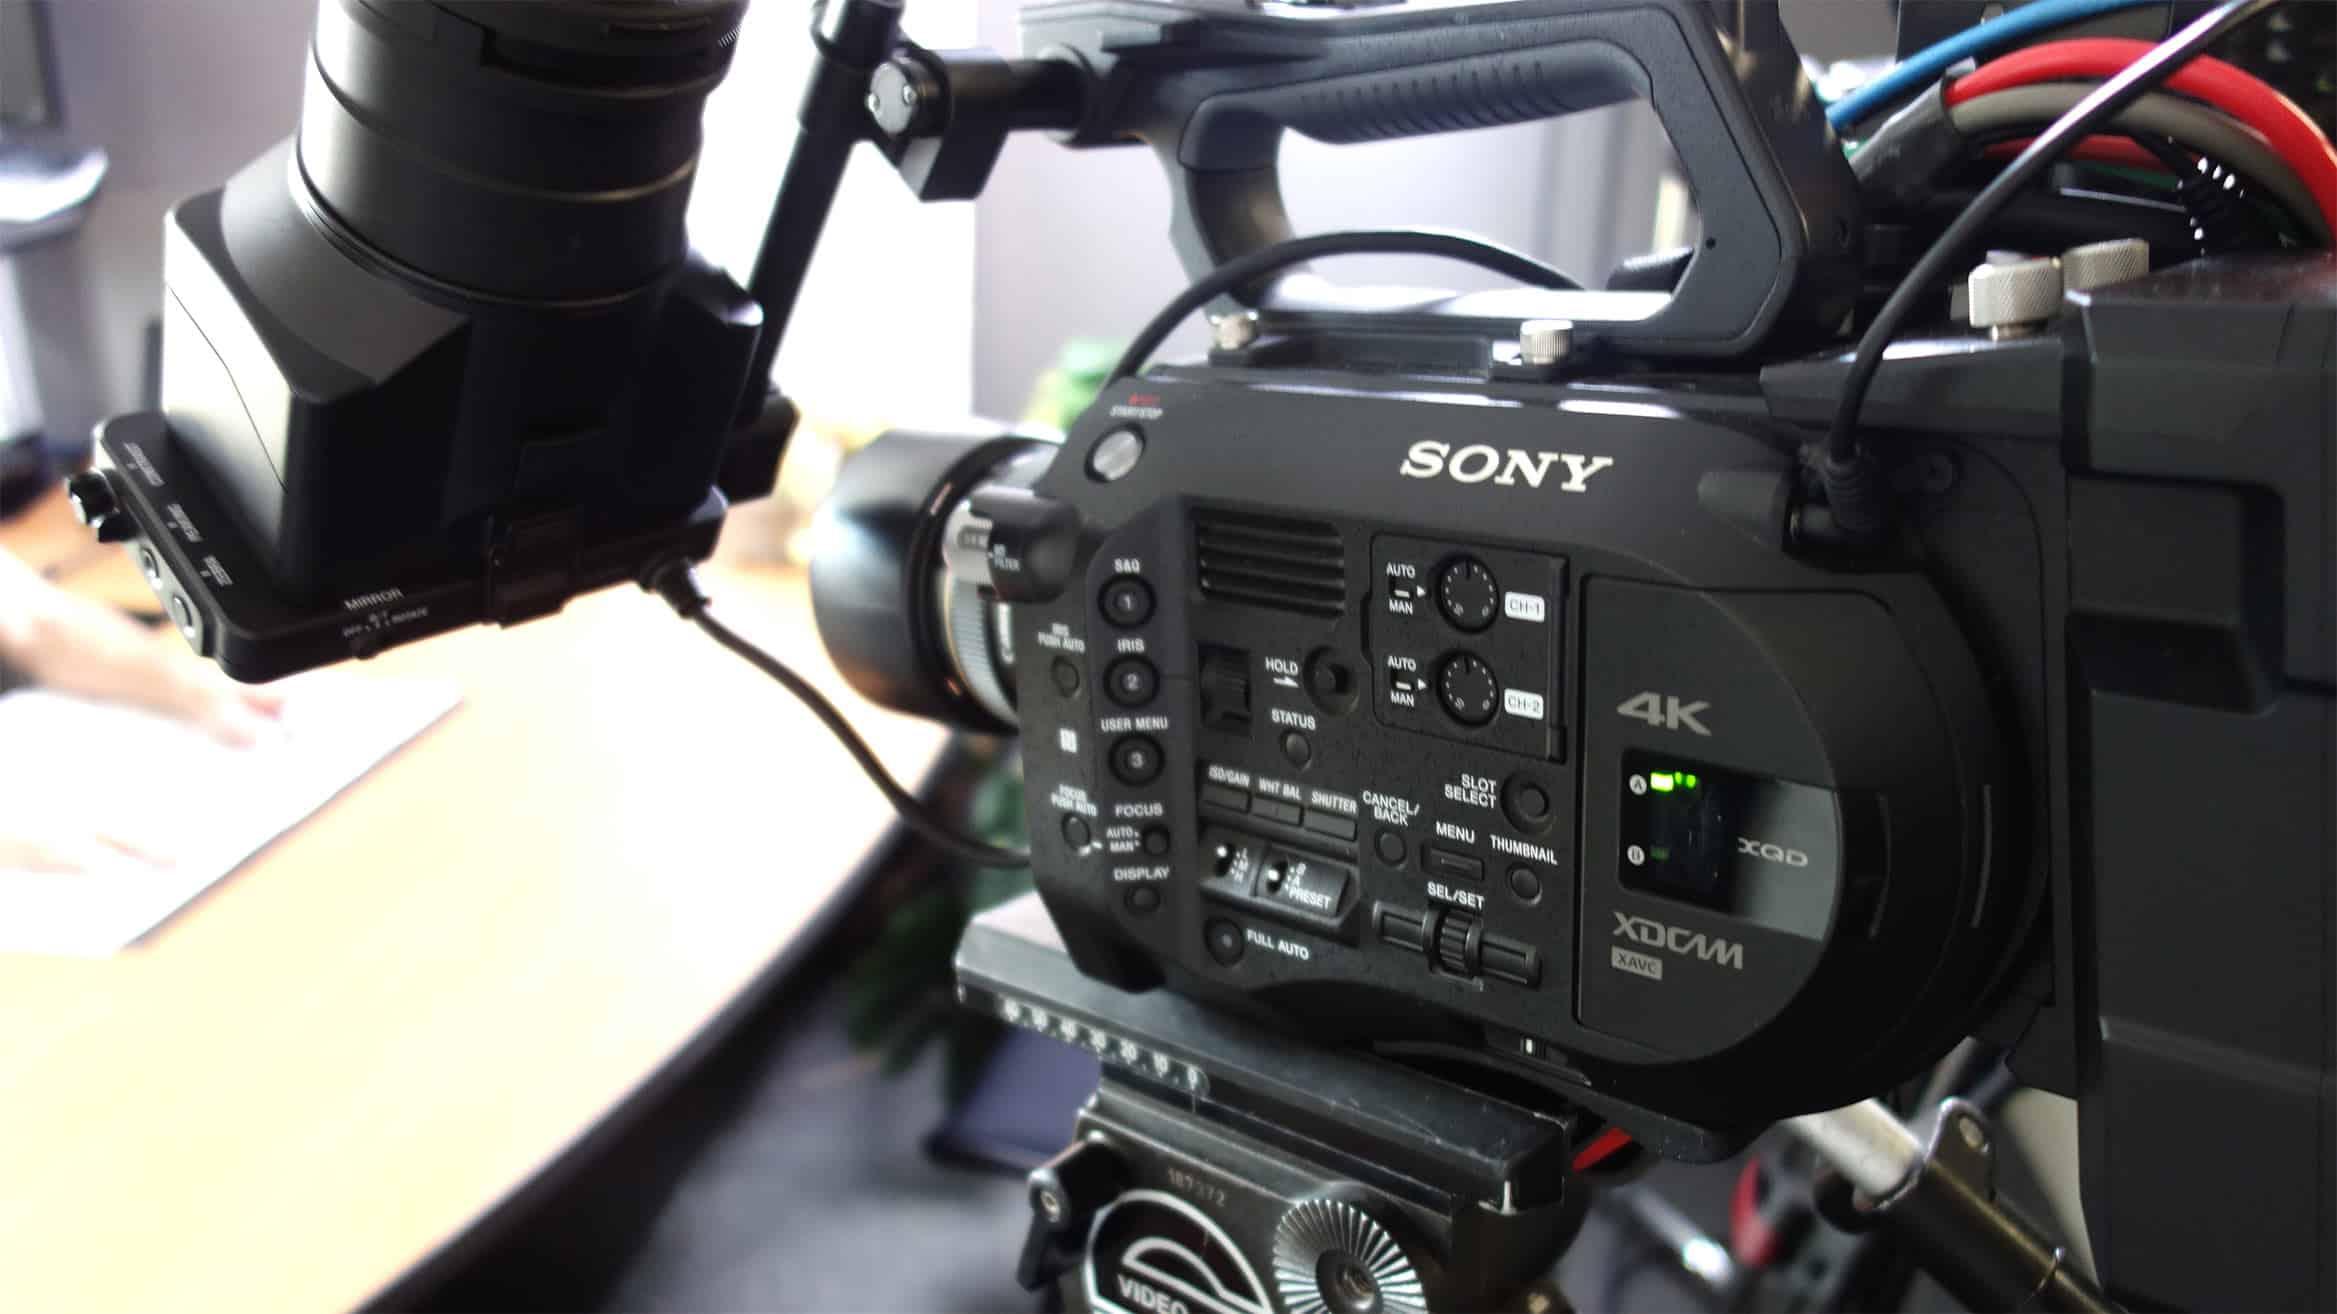 Sony 4k video camera, electronics, tripod